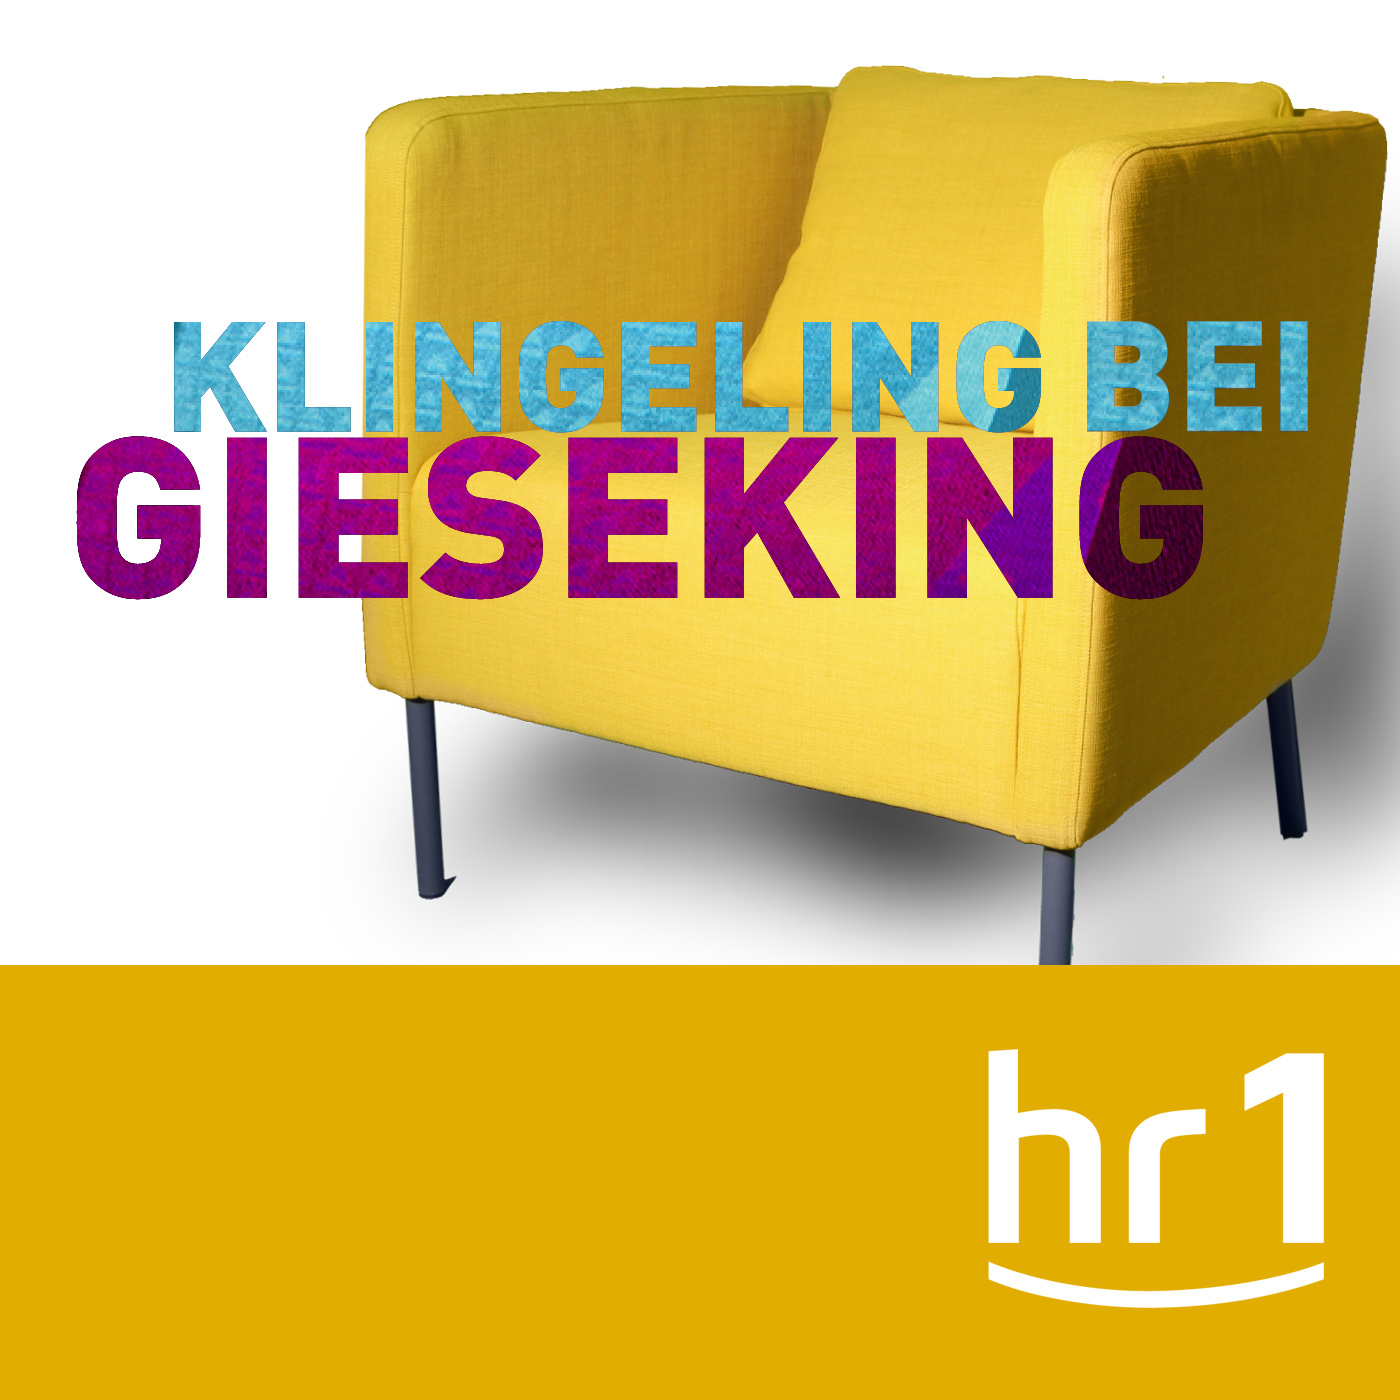 hr1 Klingeling bei Gieseking